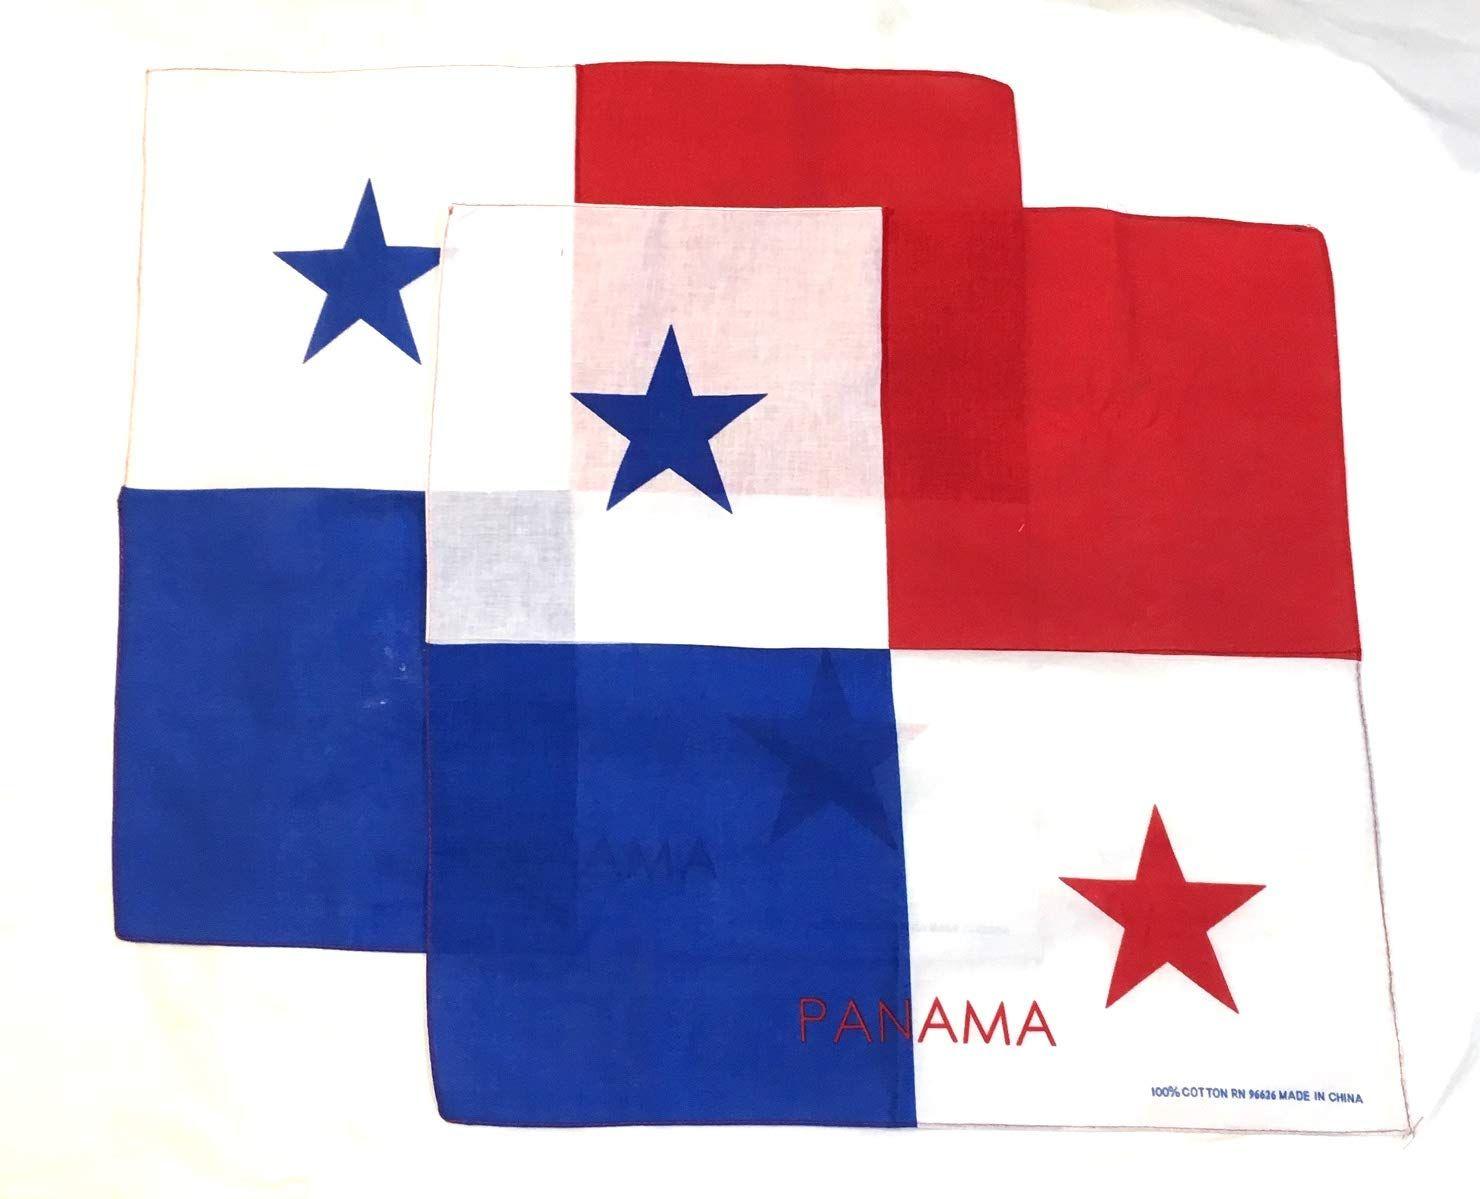 Panama Flag Bandana Flags In 2020 Flag Thailand Flag Panama Flag